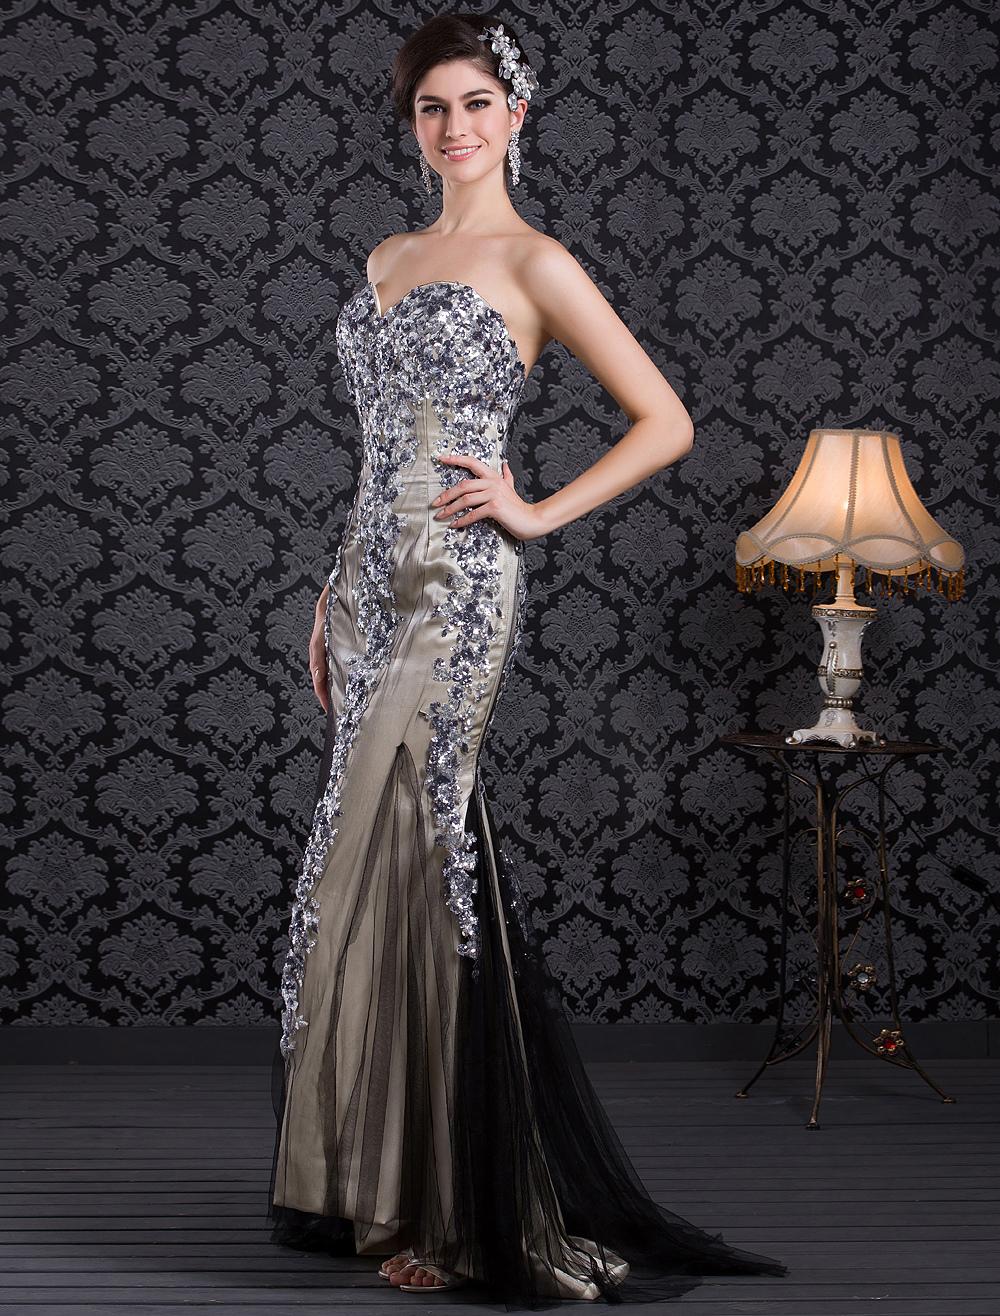 Shiny Mermaid Champagne Net Sequin Sweetheart Neck Sweep Prom Dress